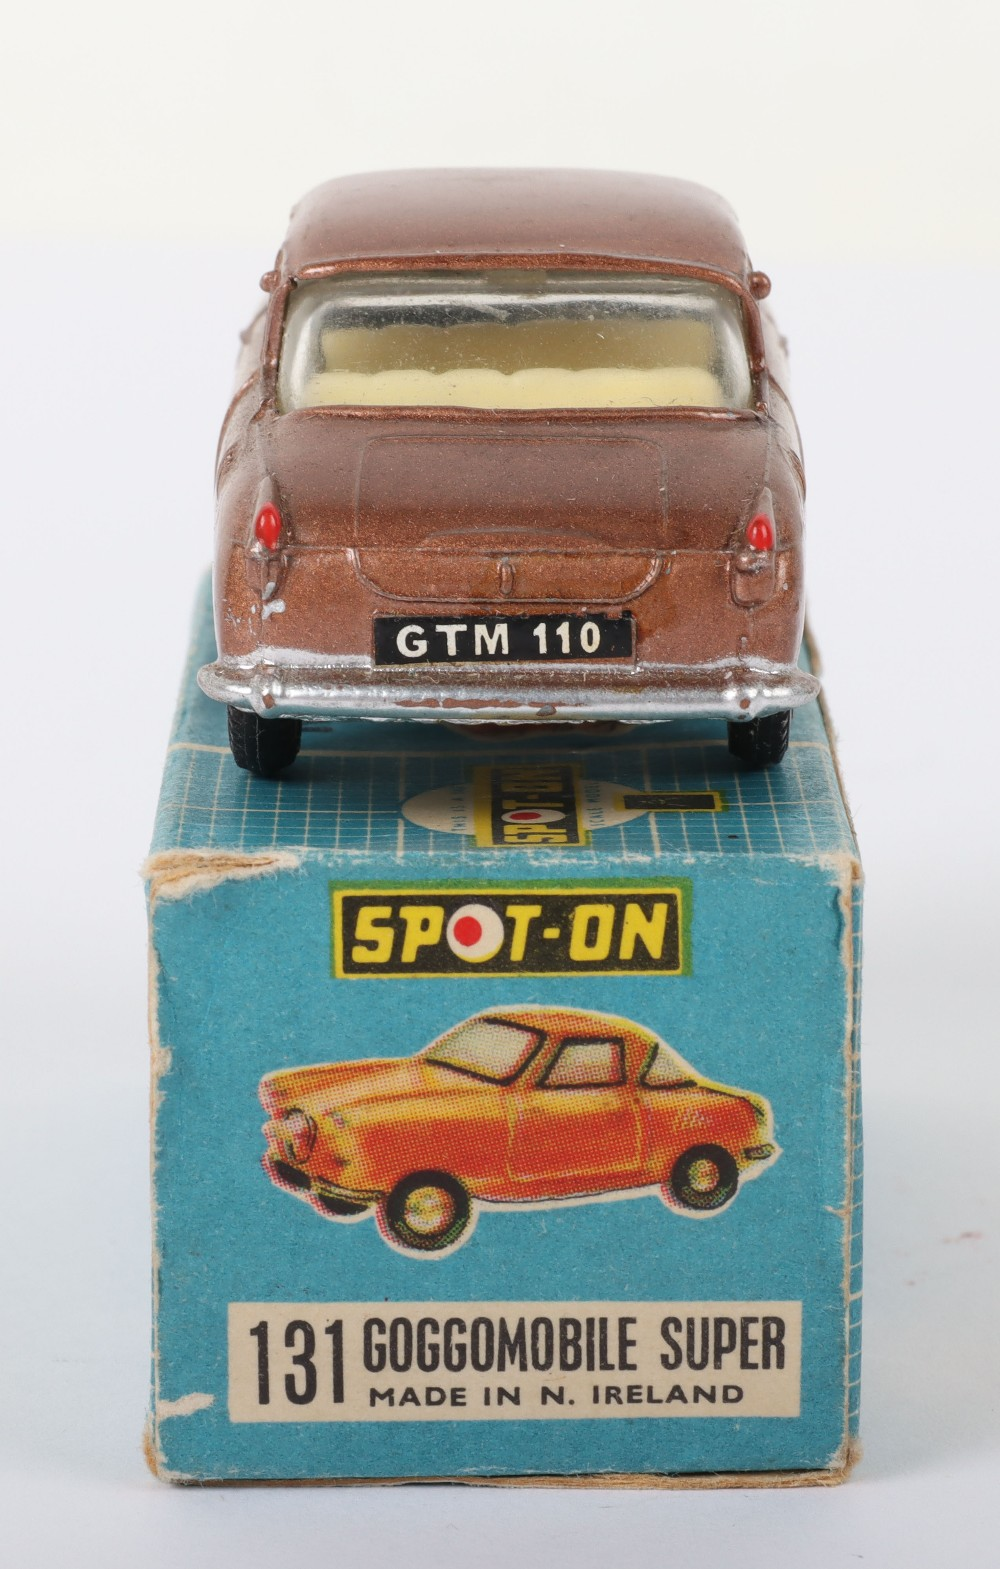 Scarce Tri-ang Spot On Model 131 Goggomobile super, Scarce metallic bronze body - Image 6 of 8